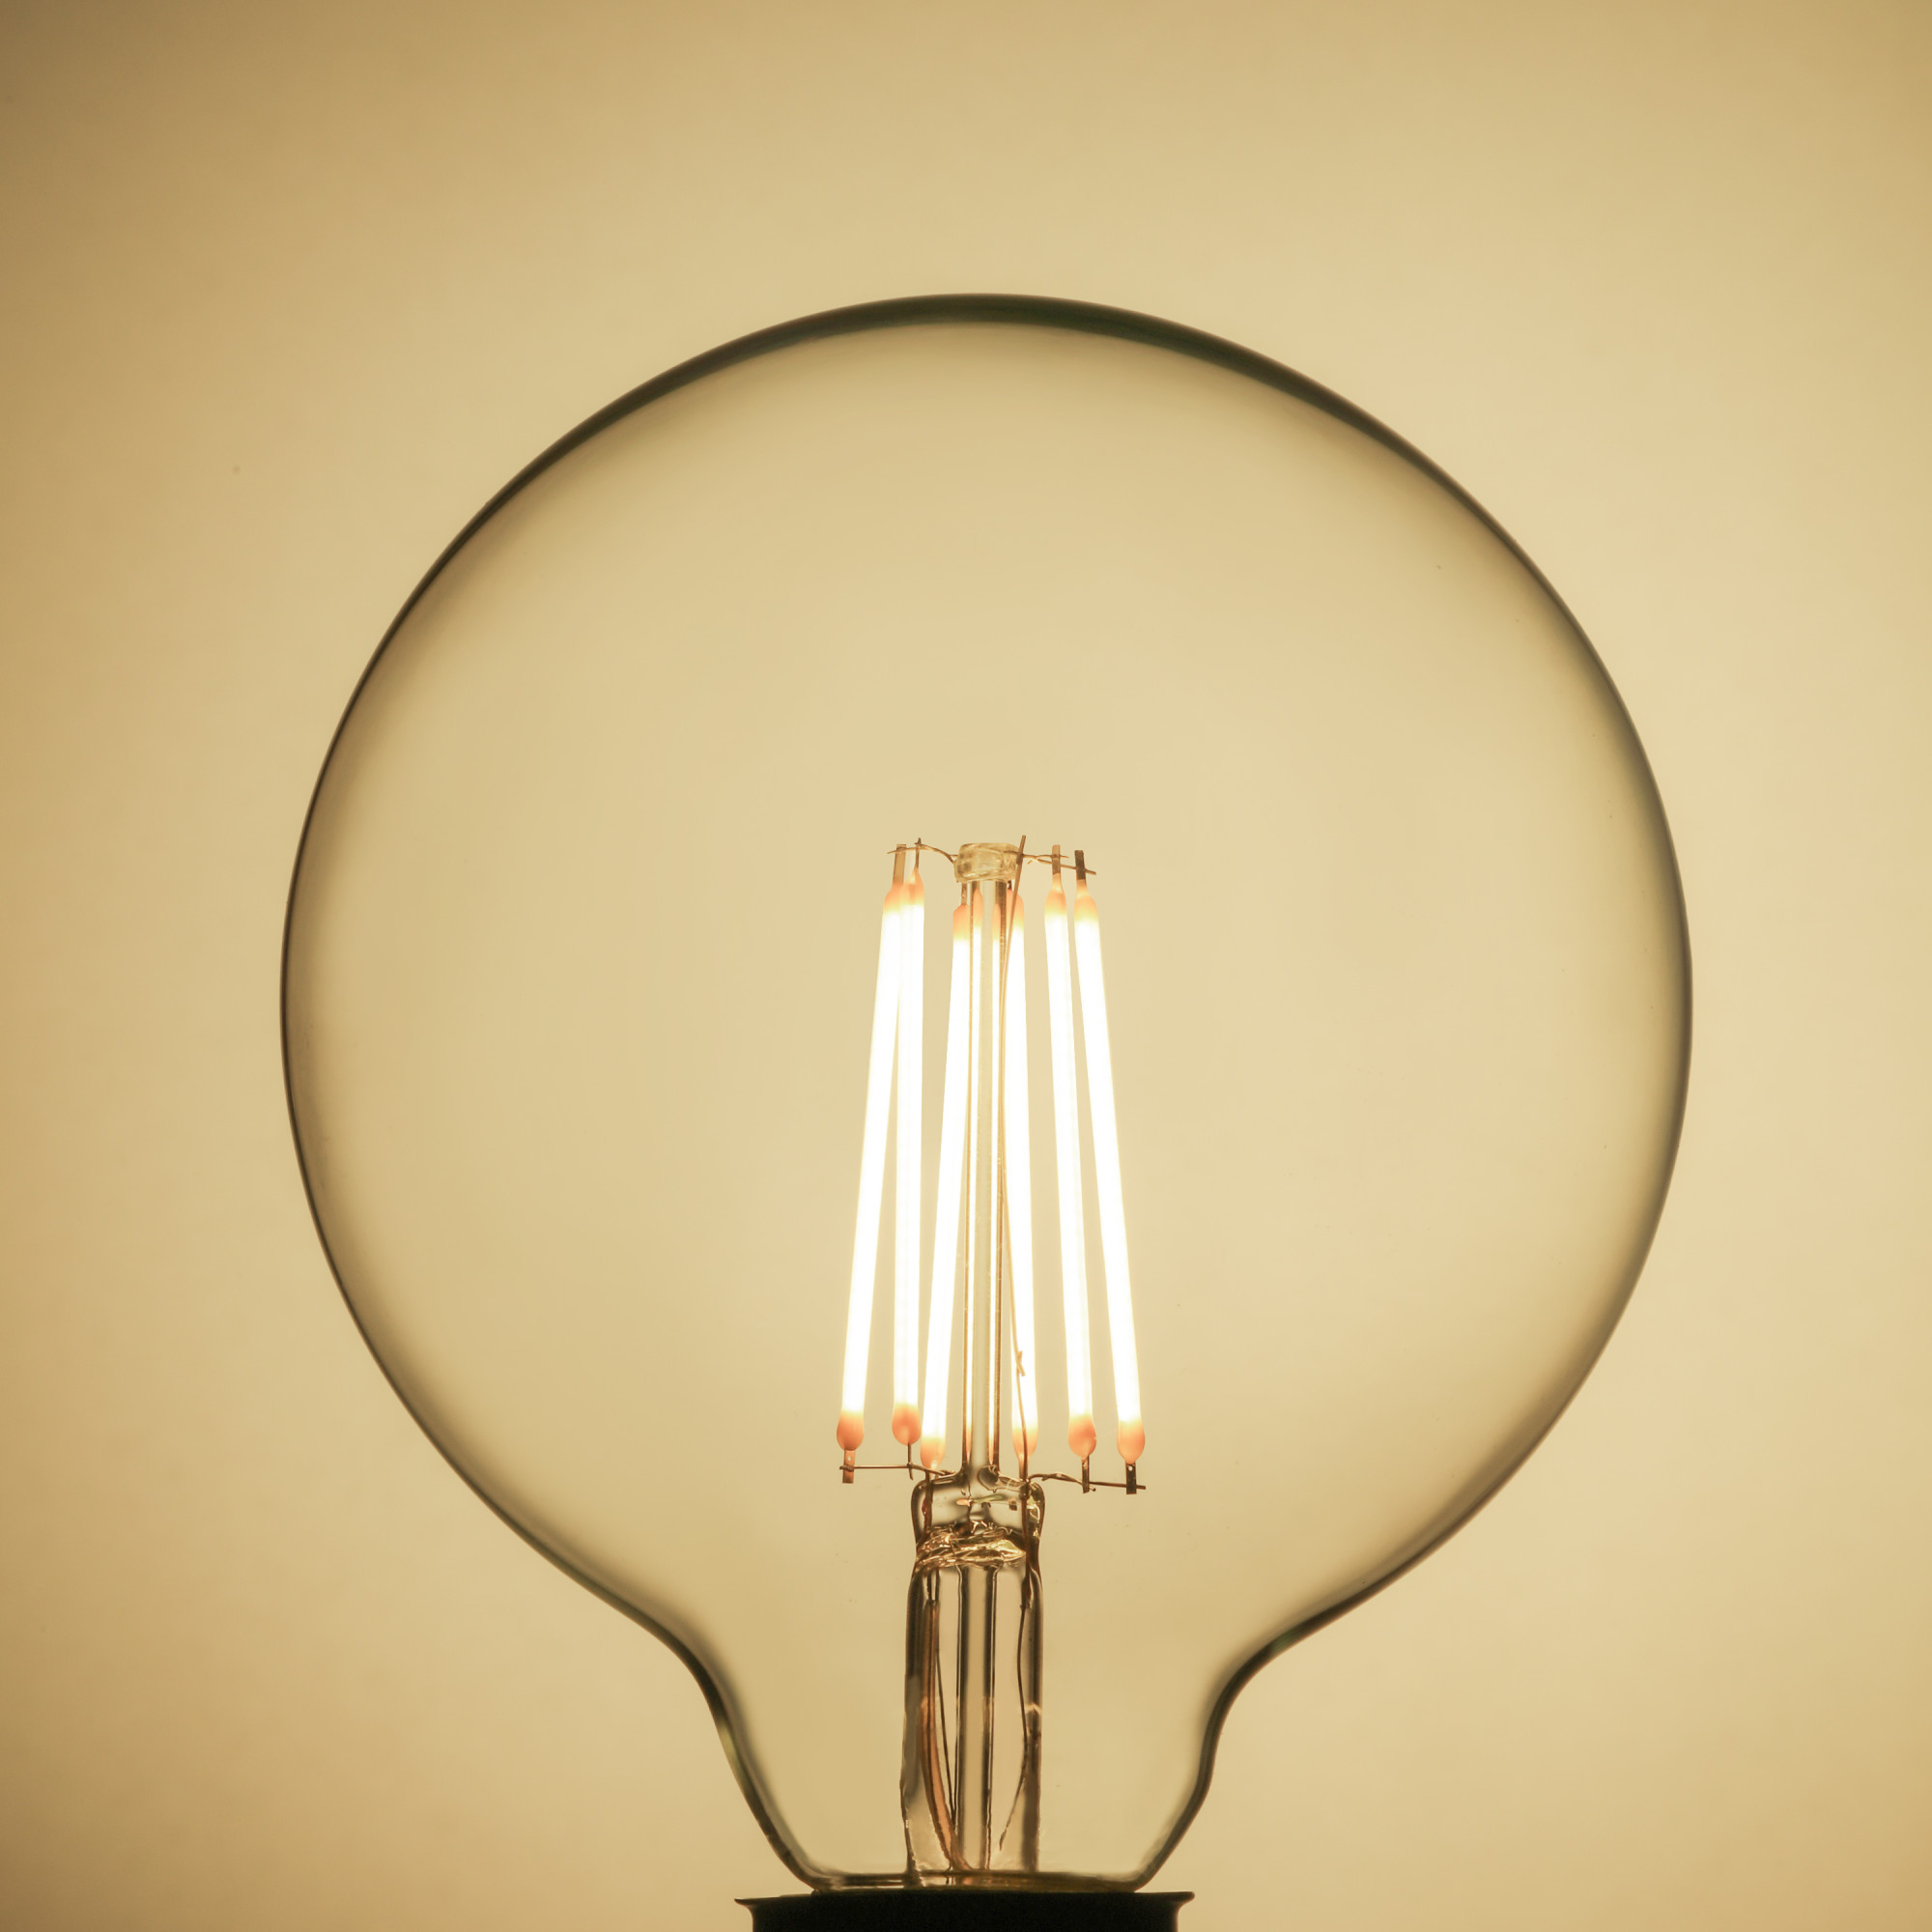 Лампа светодиодная Lexman E27 12 Вт 1521 Лм 4000K